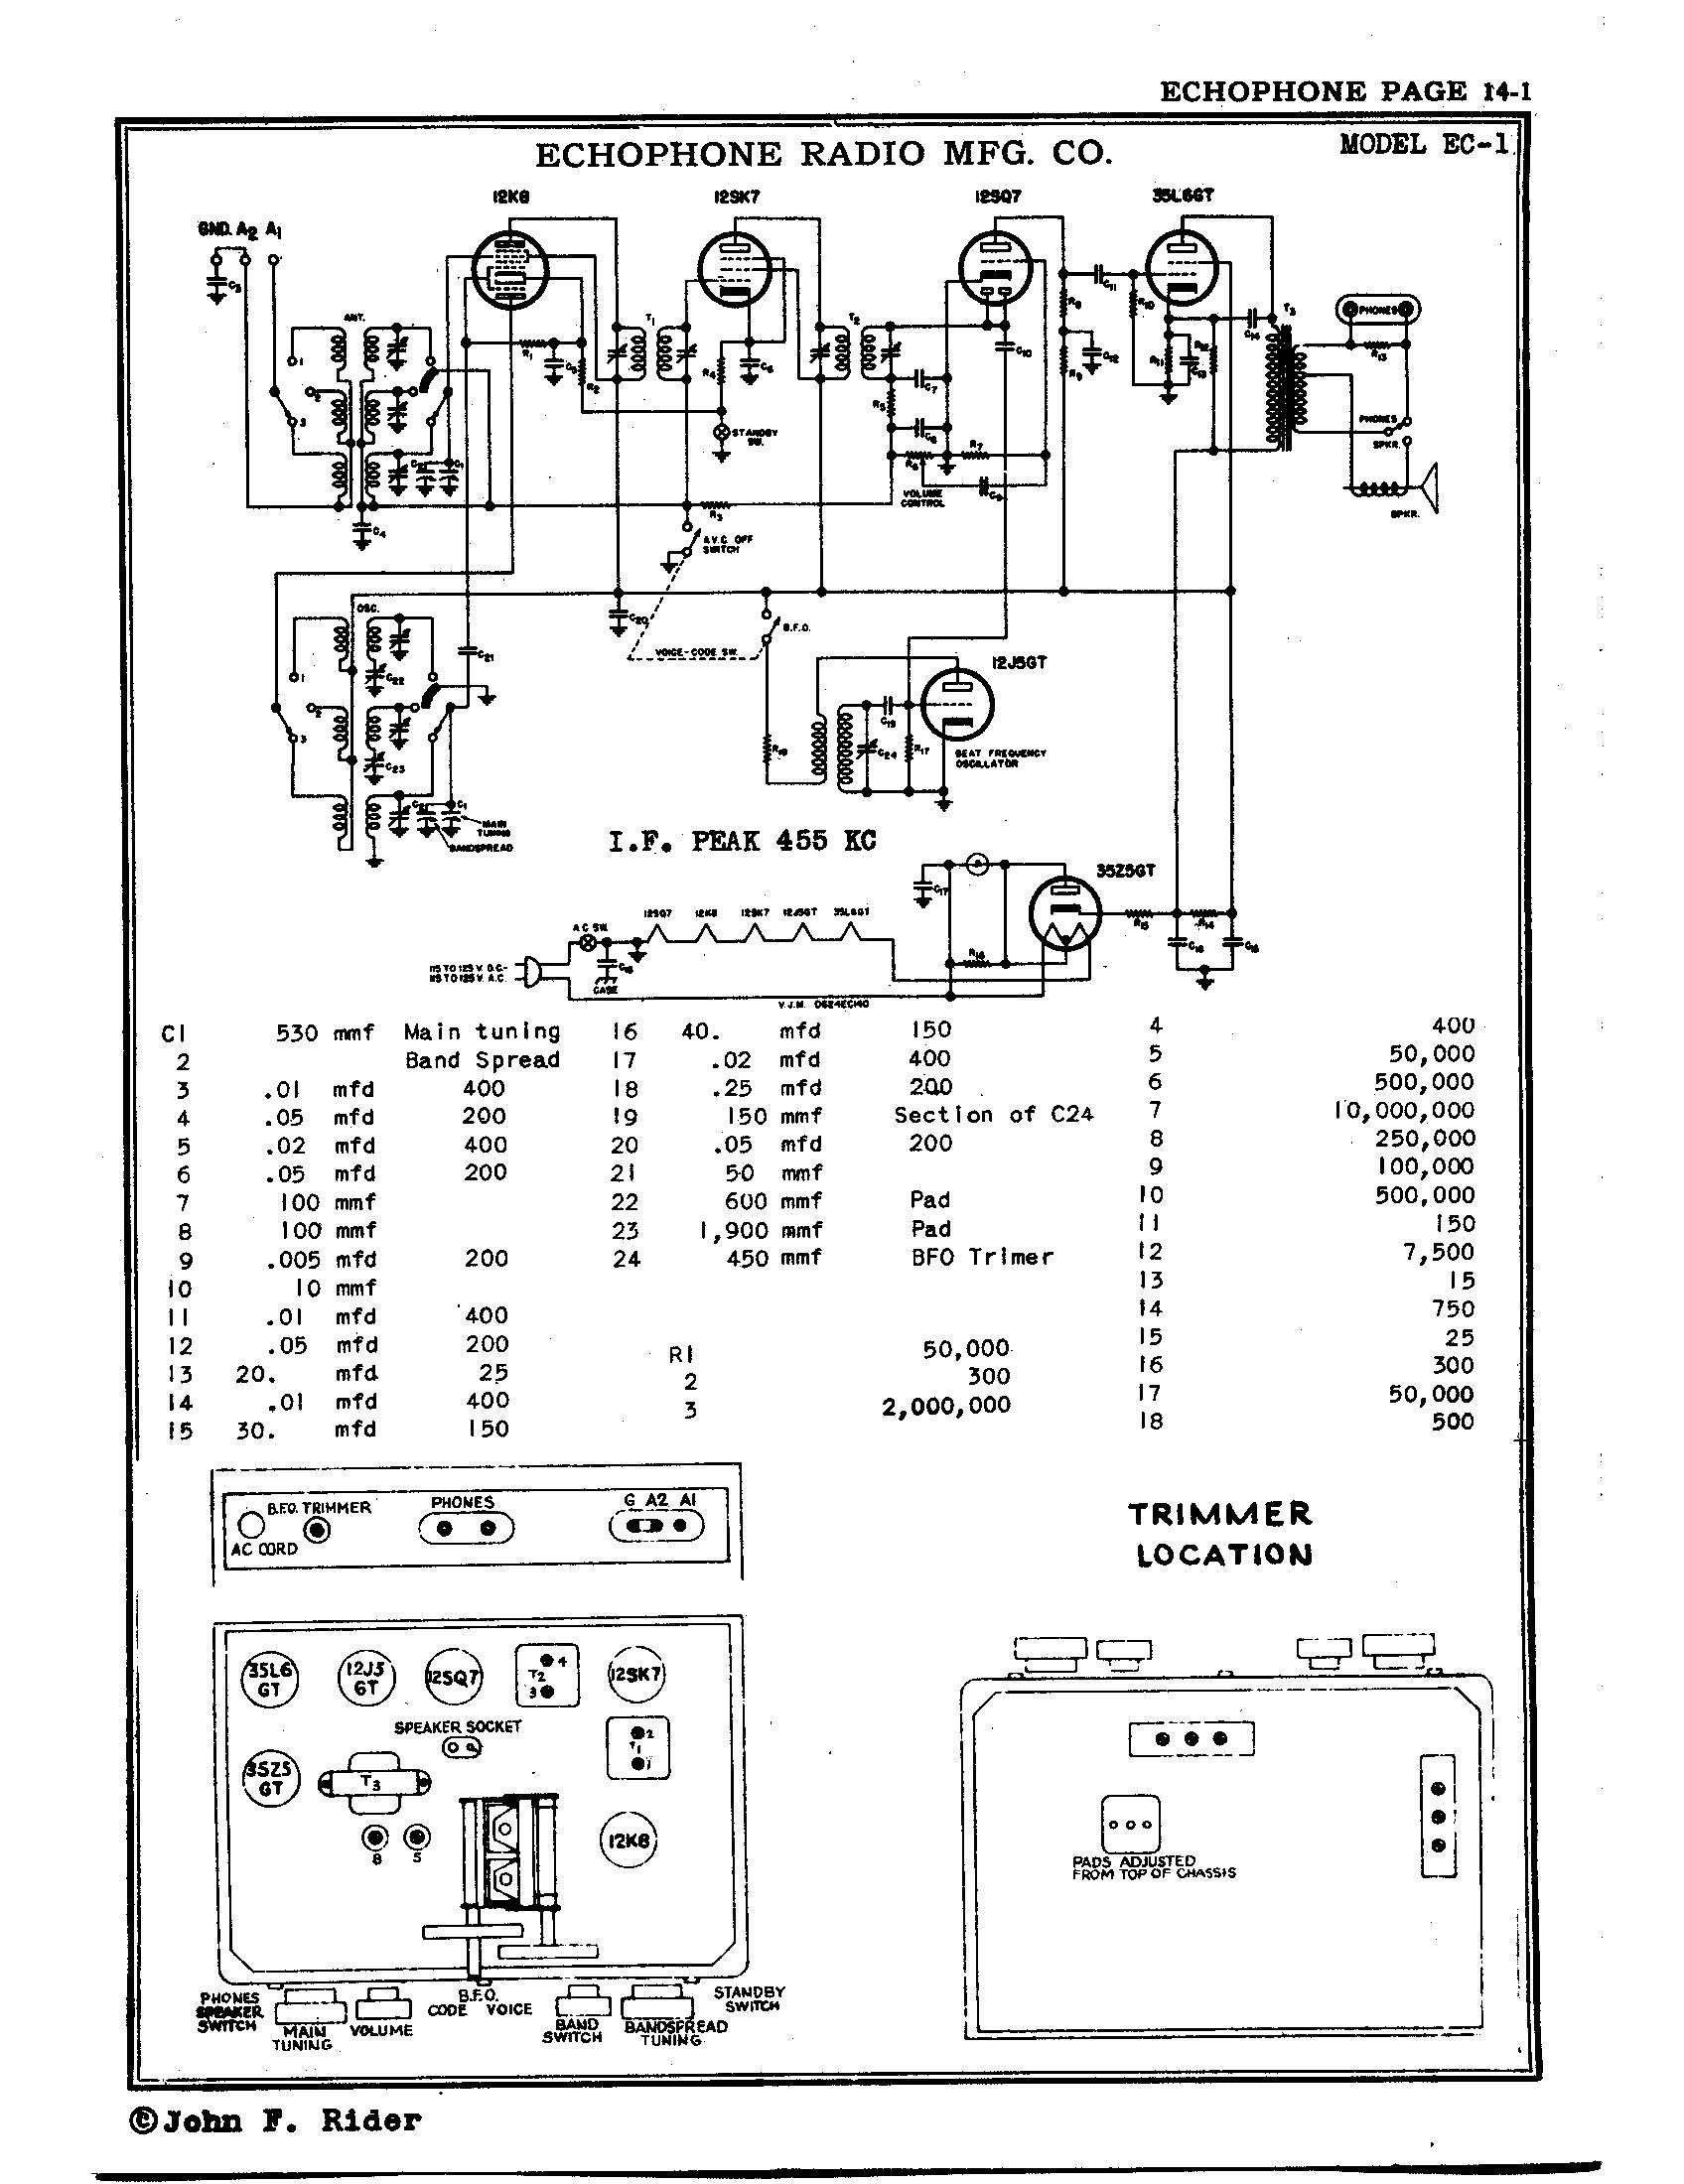 Echophone Ec 1b Manual Treadmill :: skybirdtheory